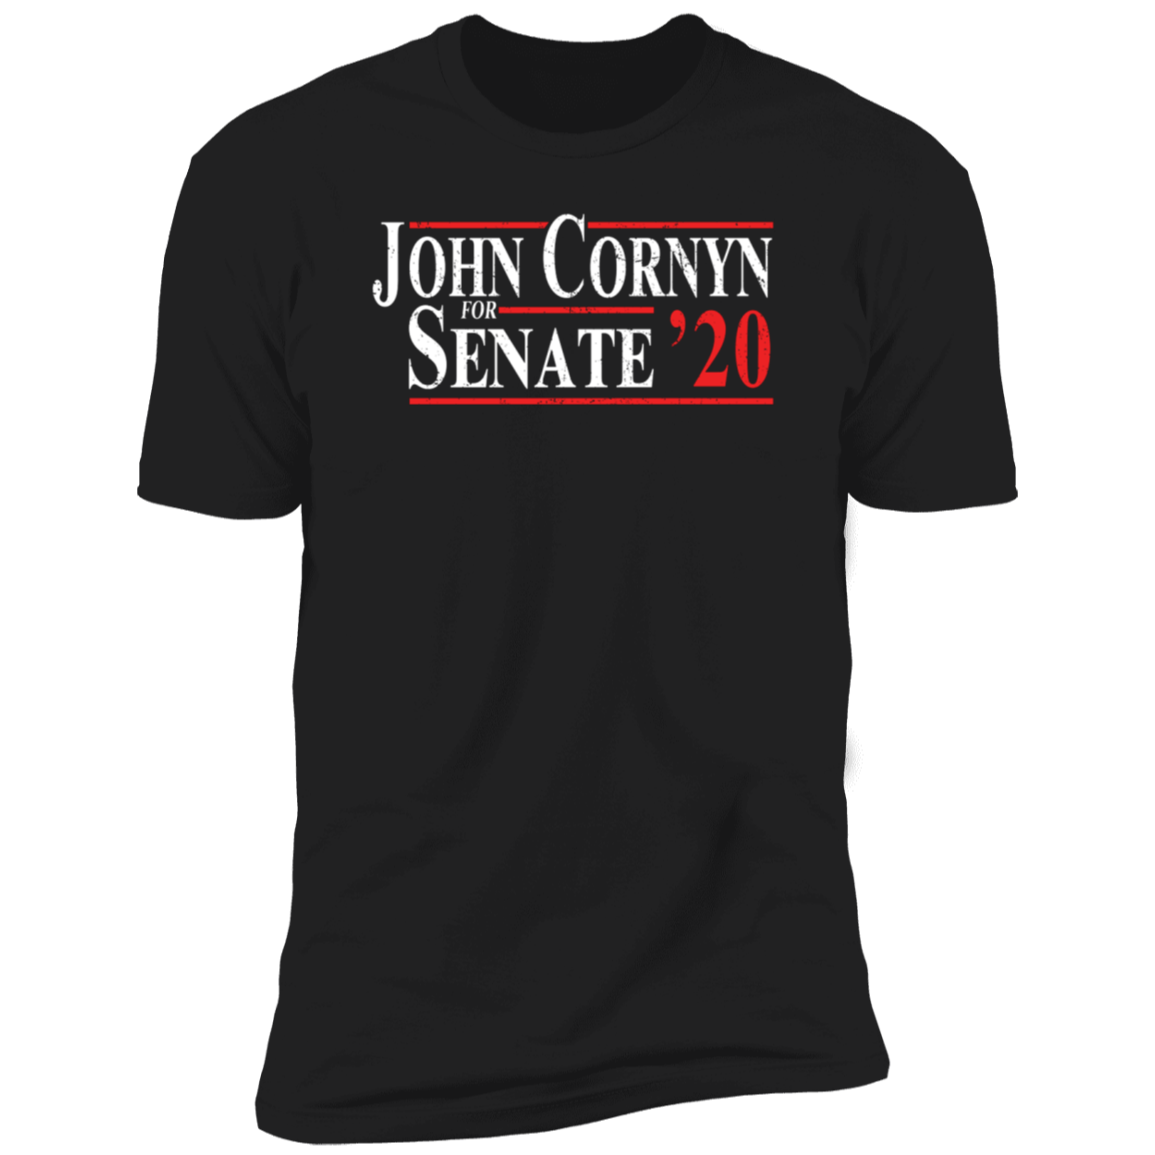 John Cornyn For Senate 2020 Shirt